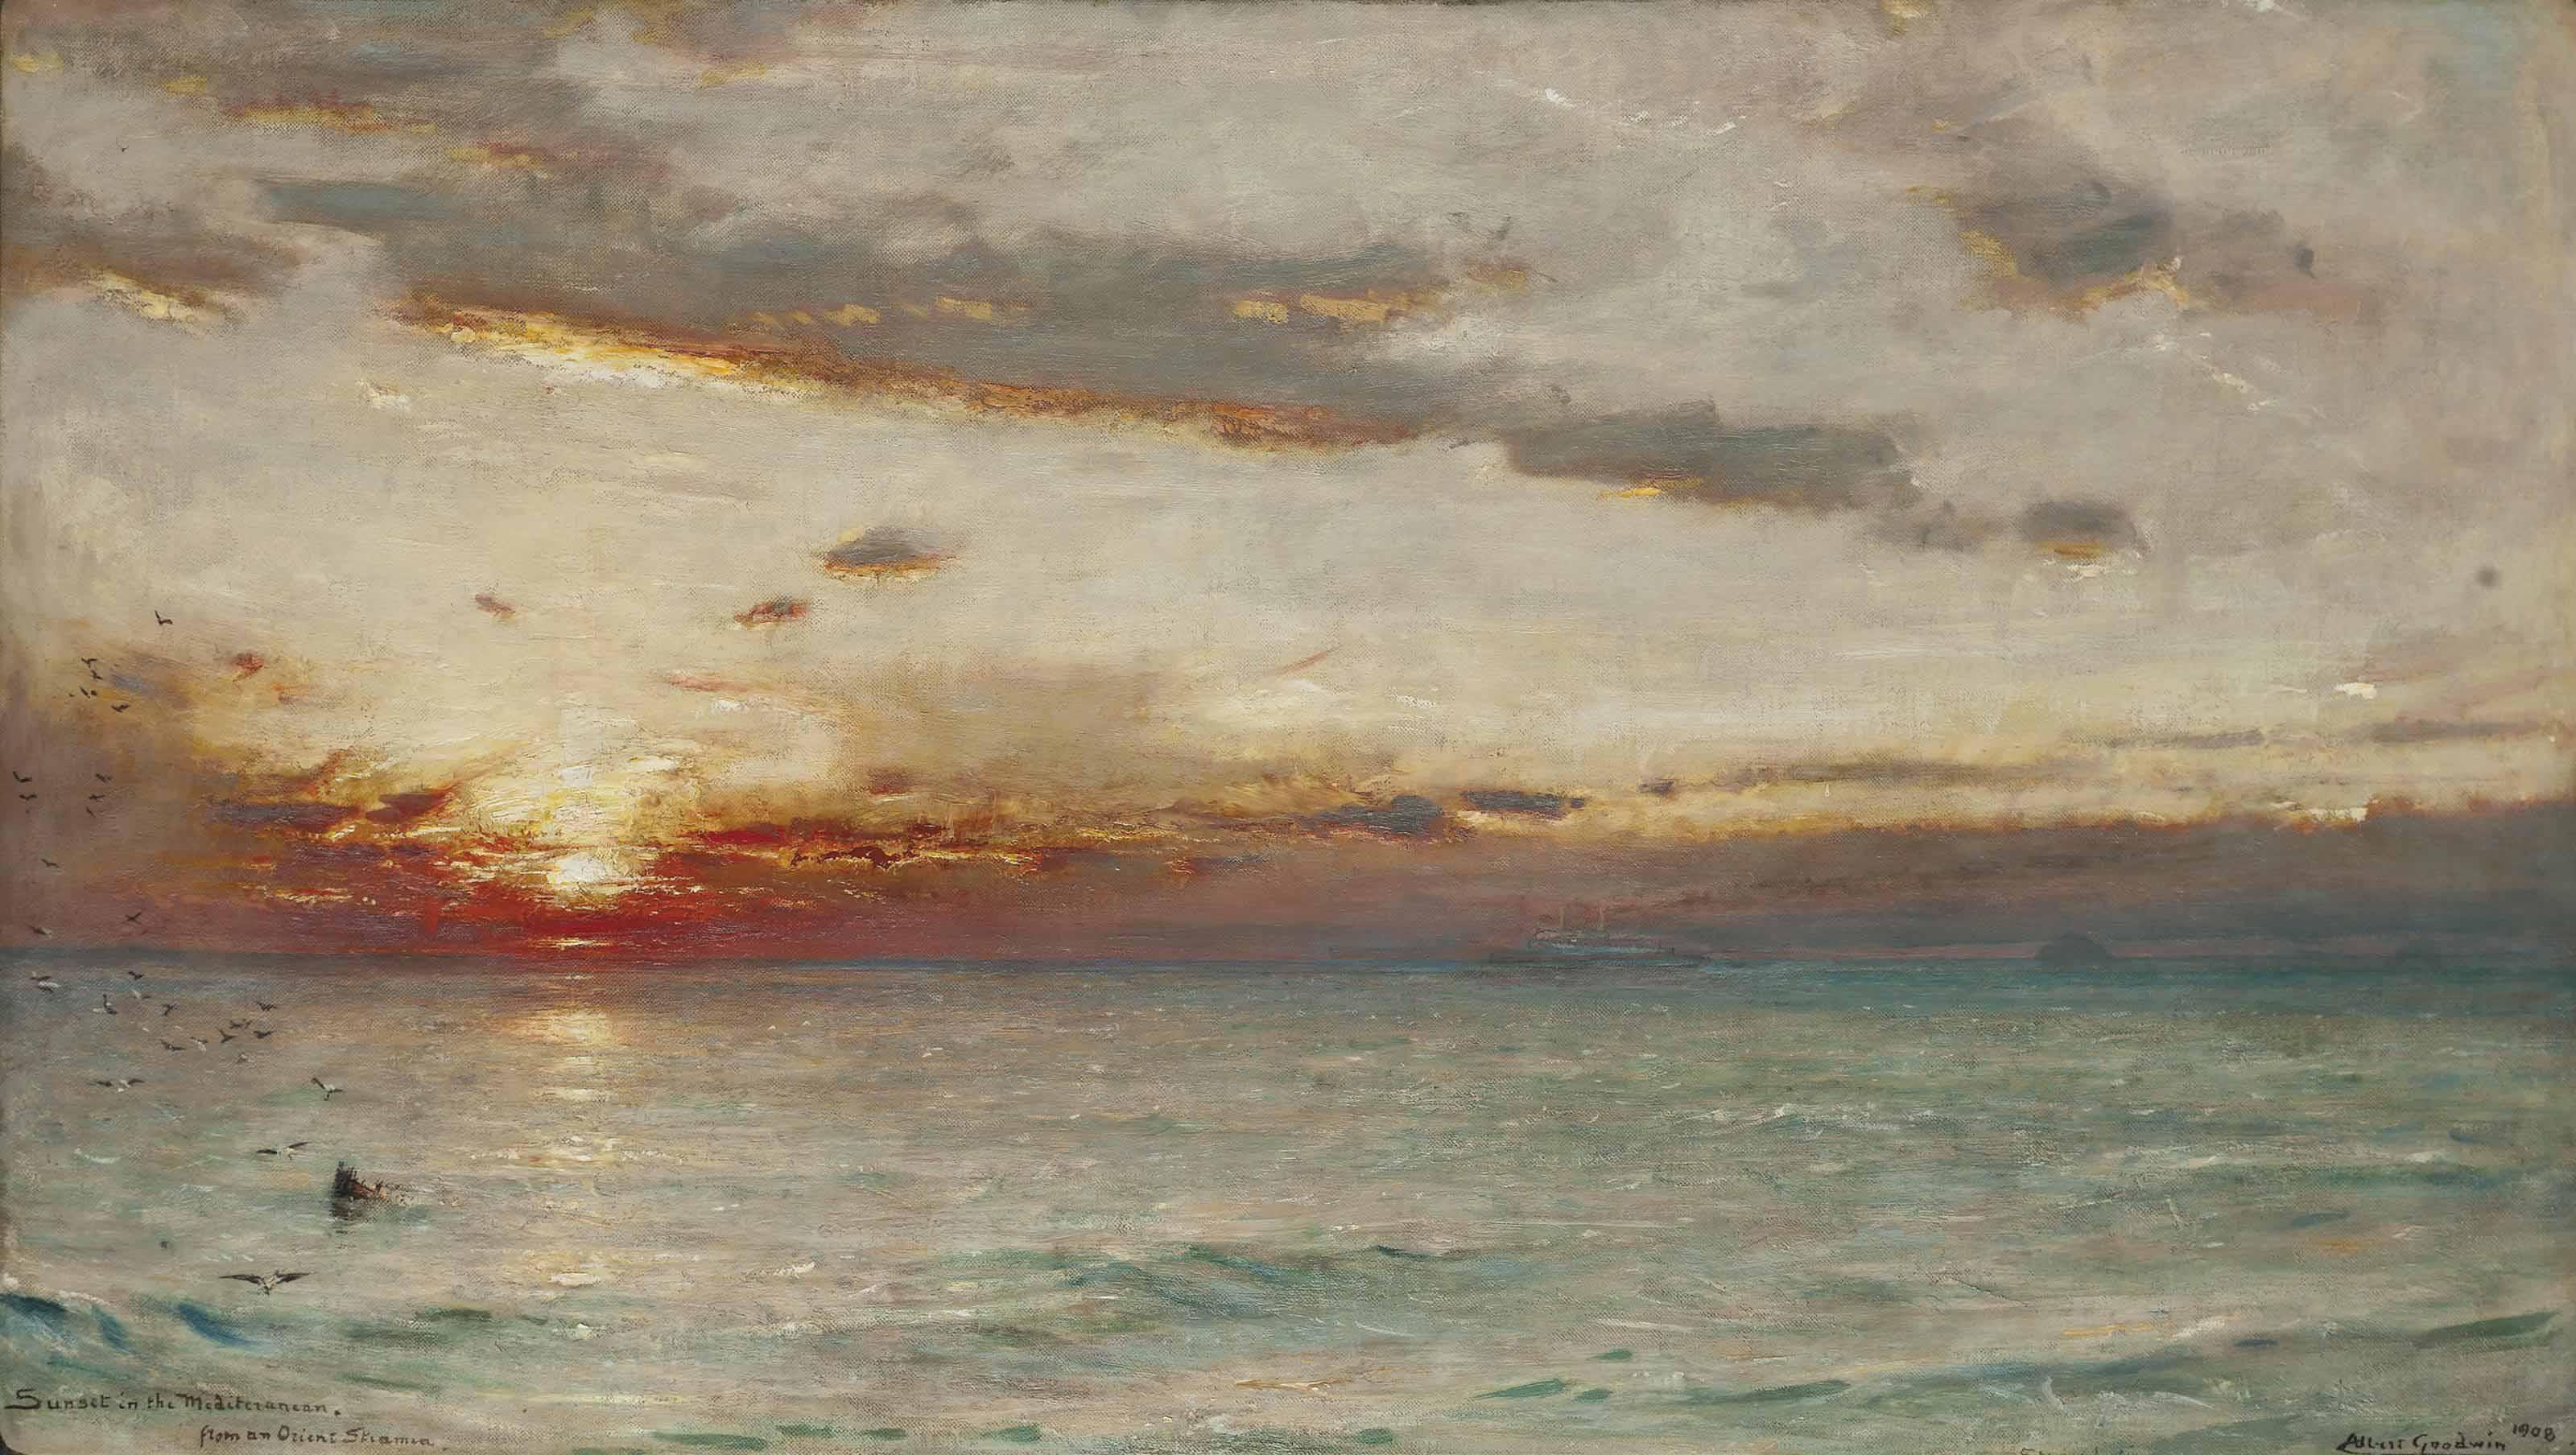 Sunset in the Mediterranean from an Orient steamer